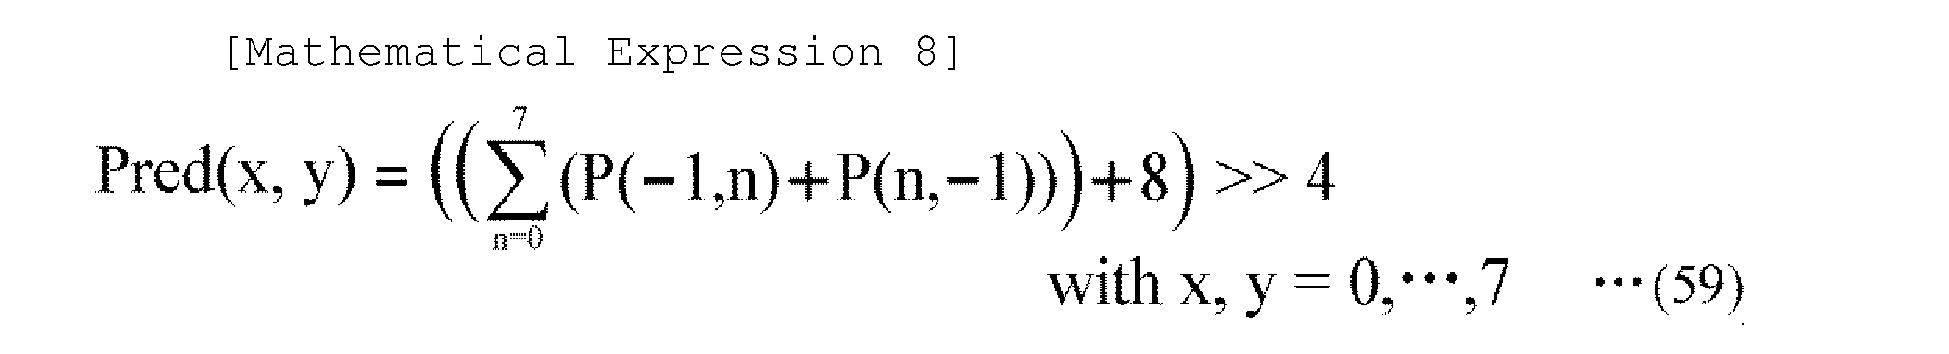 Figure imgb0065